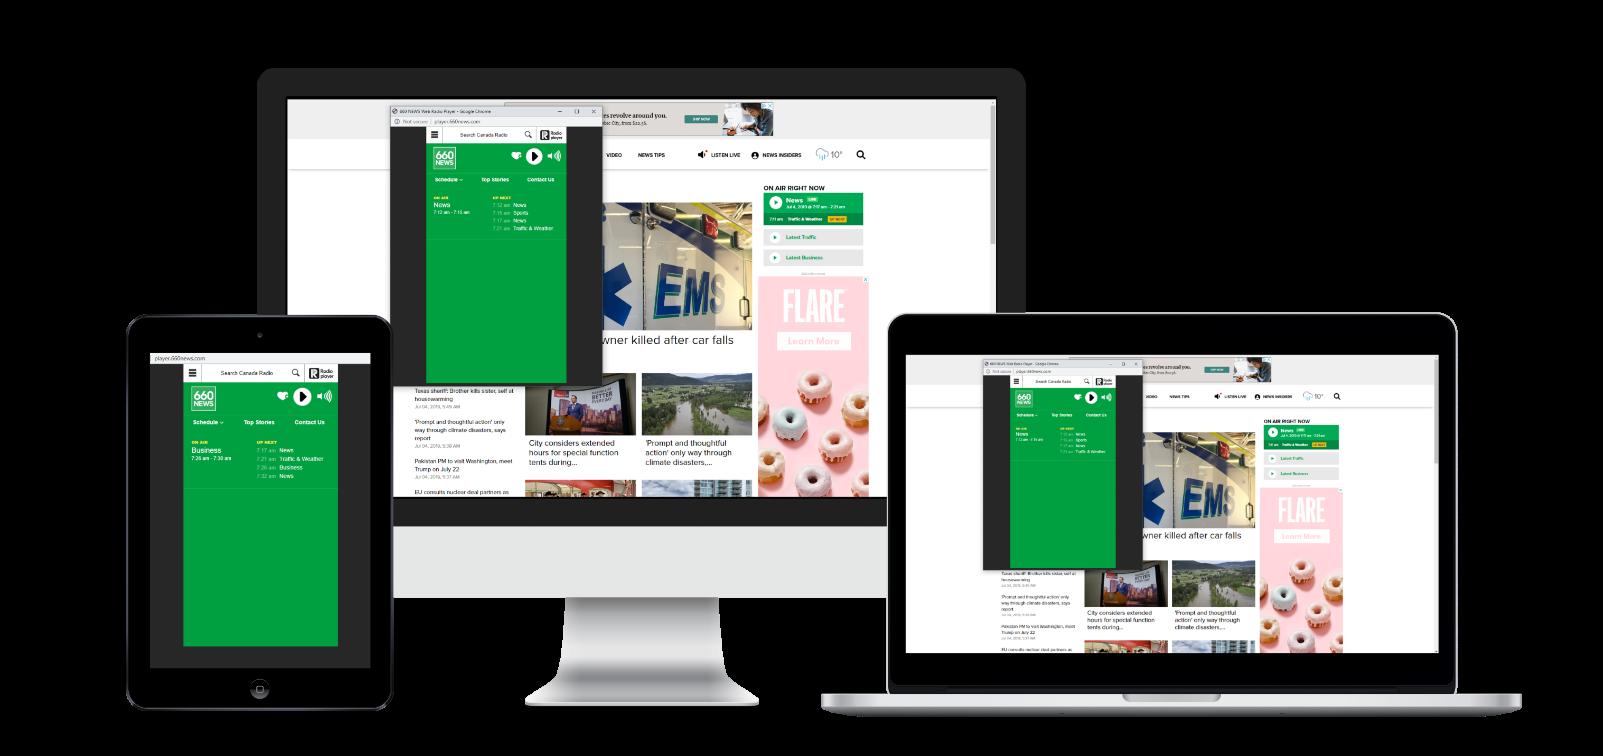 660 NEWS Web Player